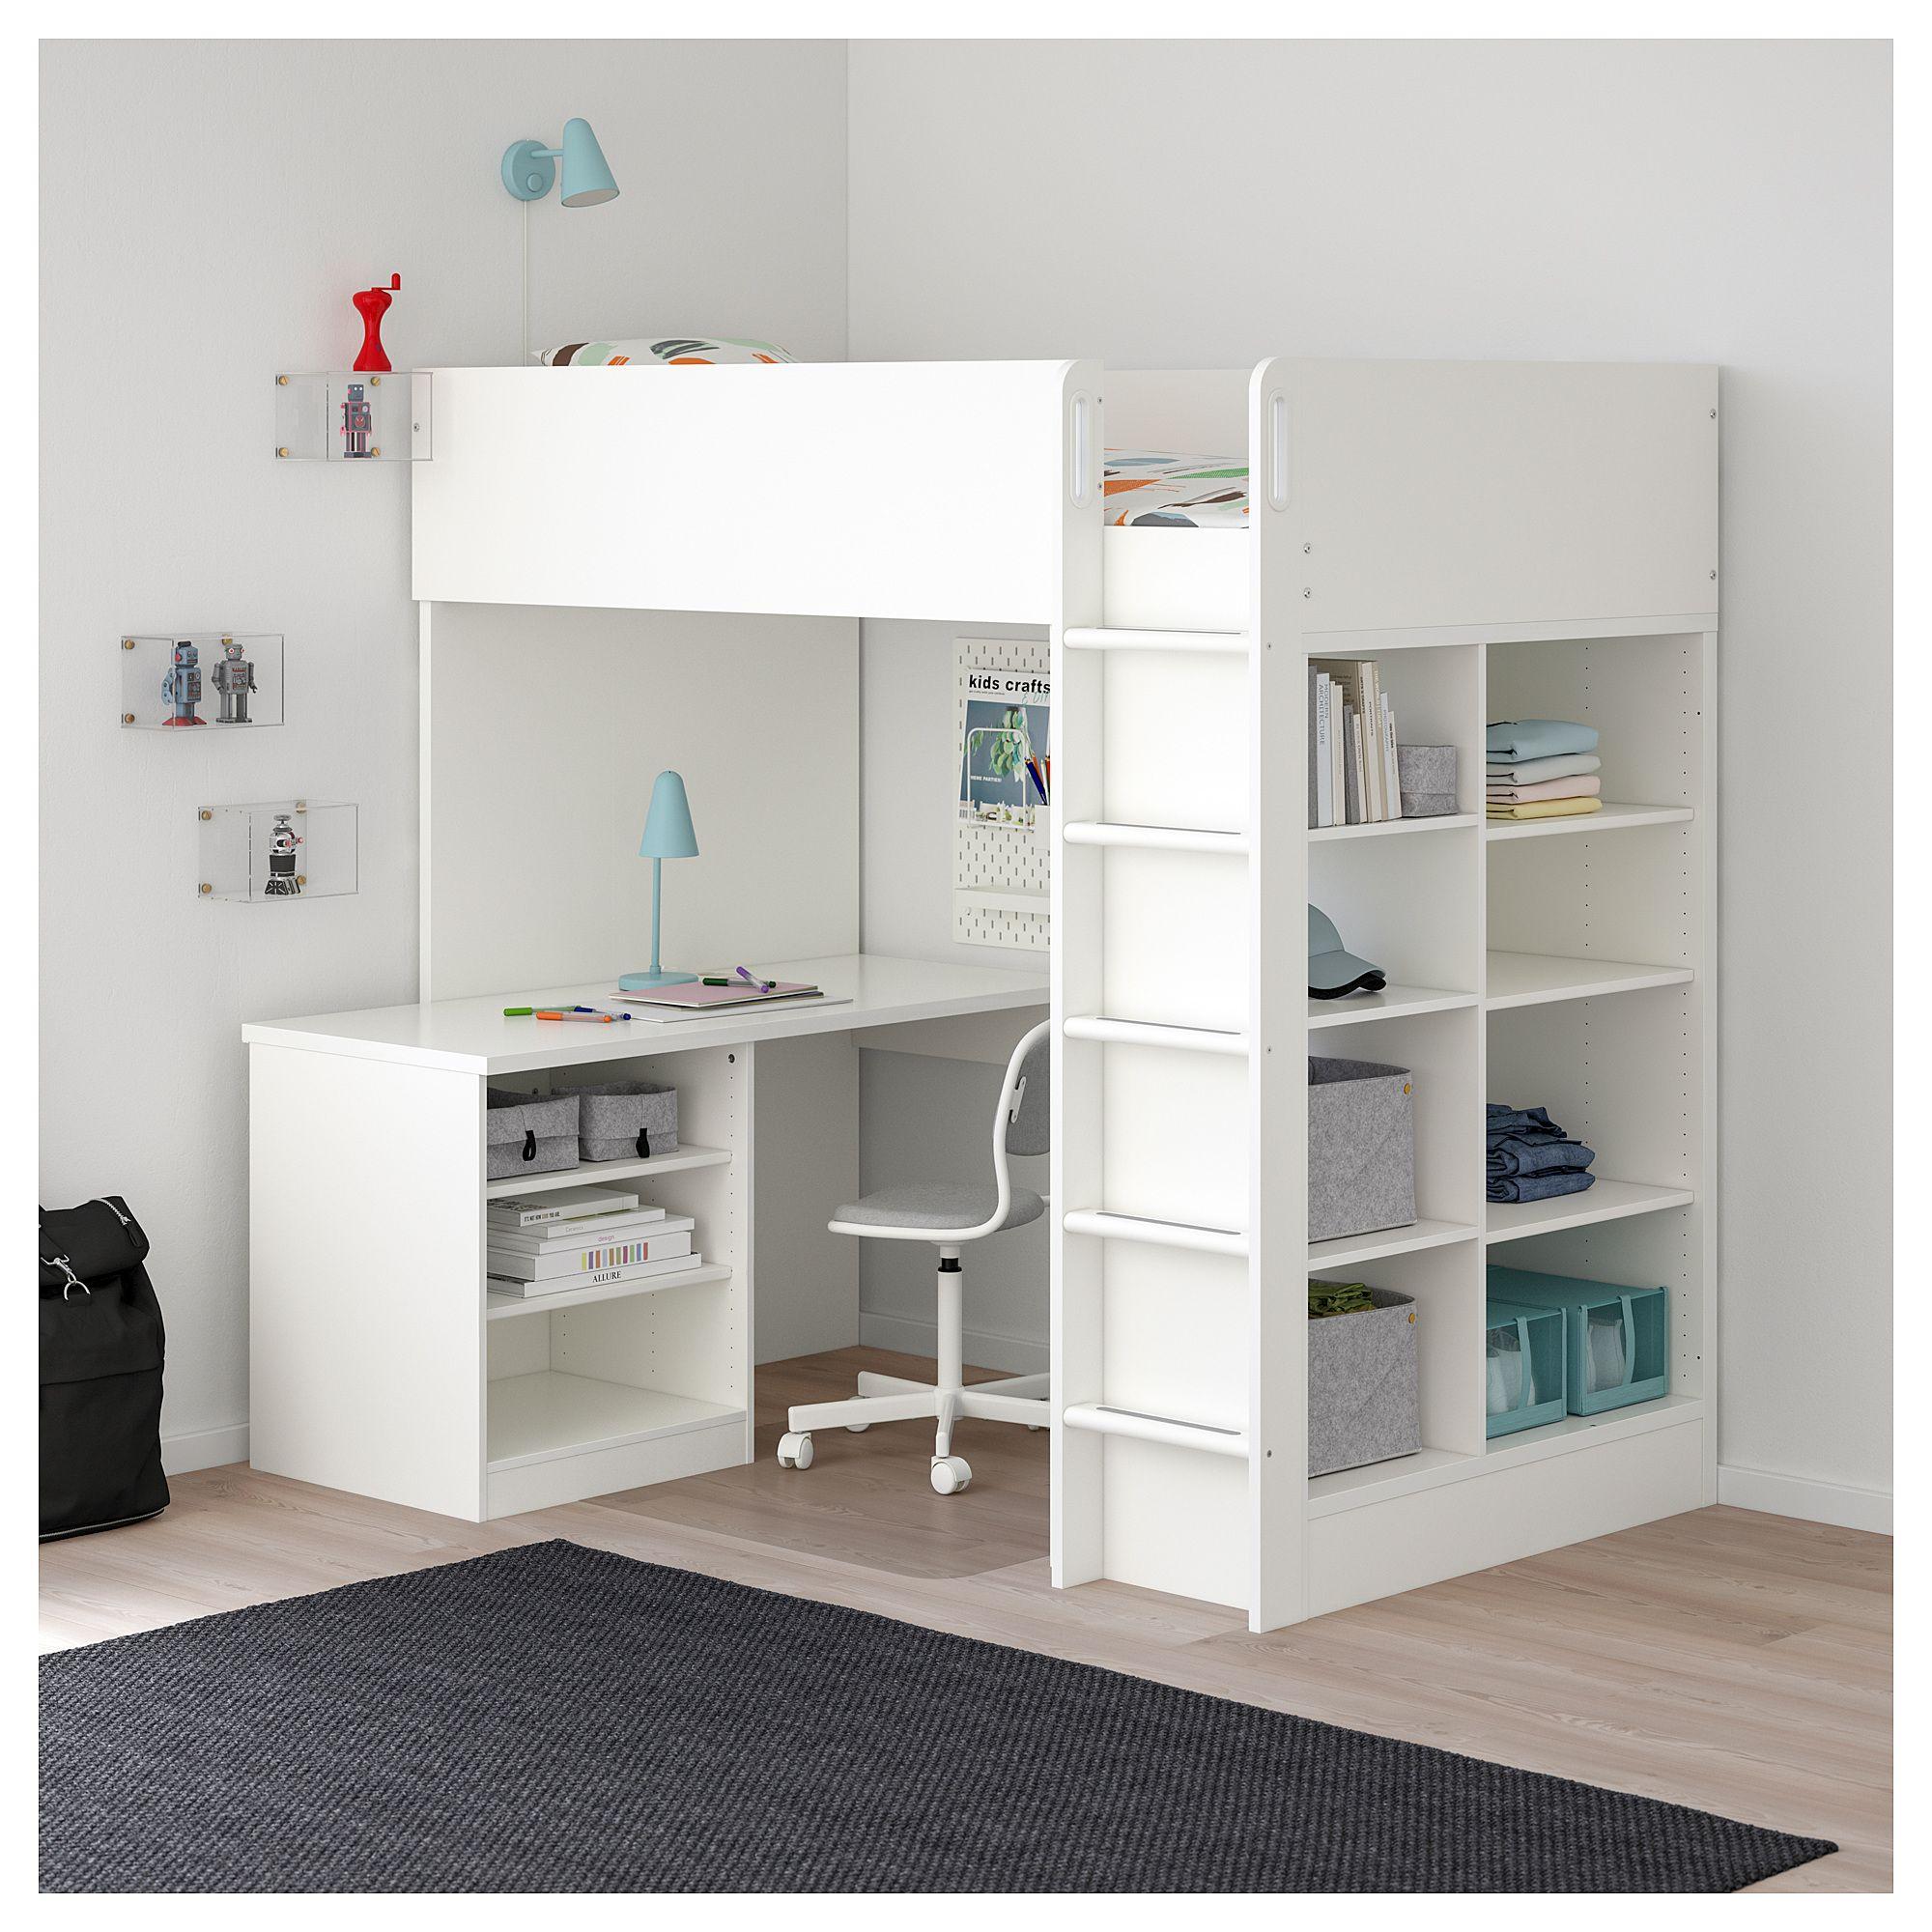 Best Ikea Stuva Loft Bed Combo W 2 Shlvs 3 Shlvs White 400 x 300